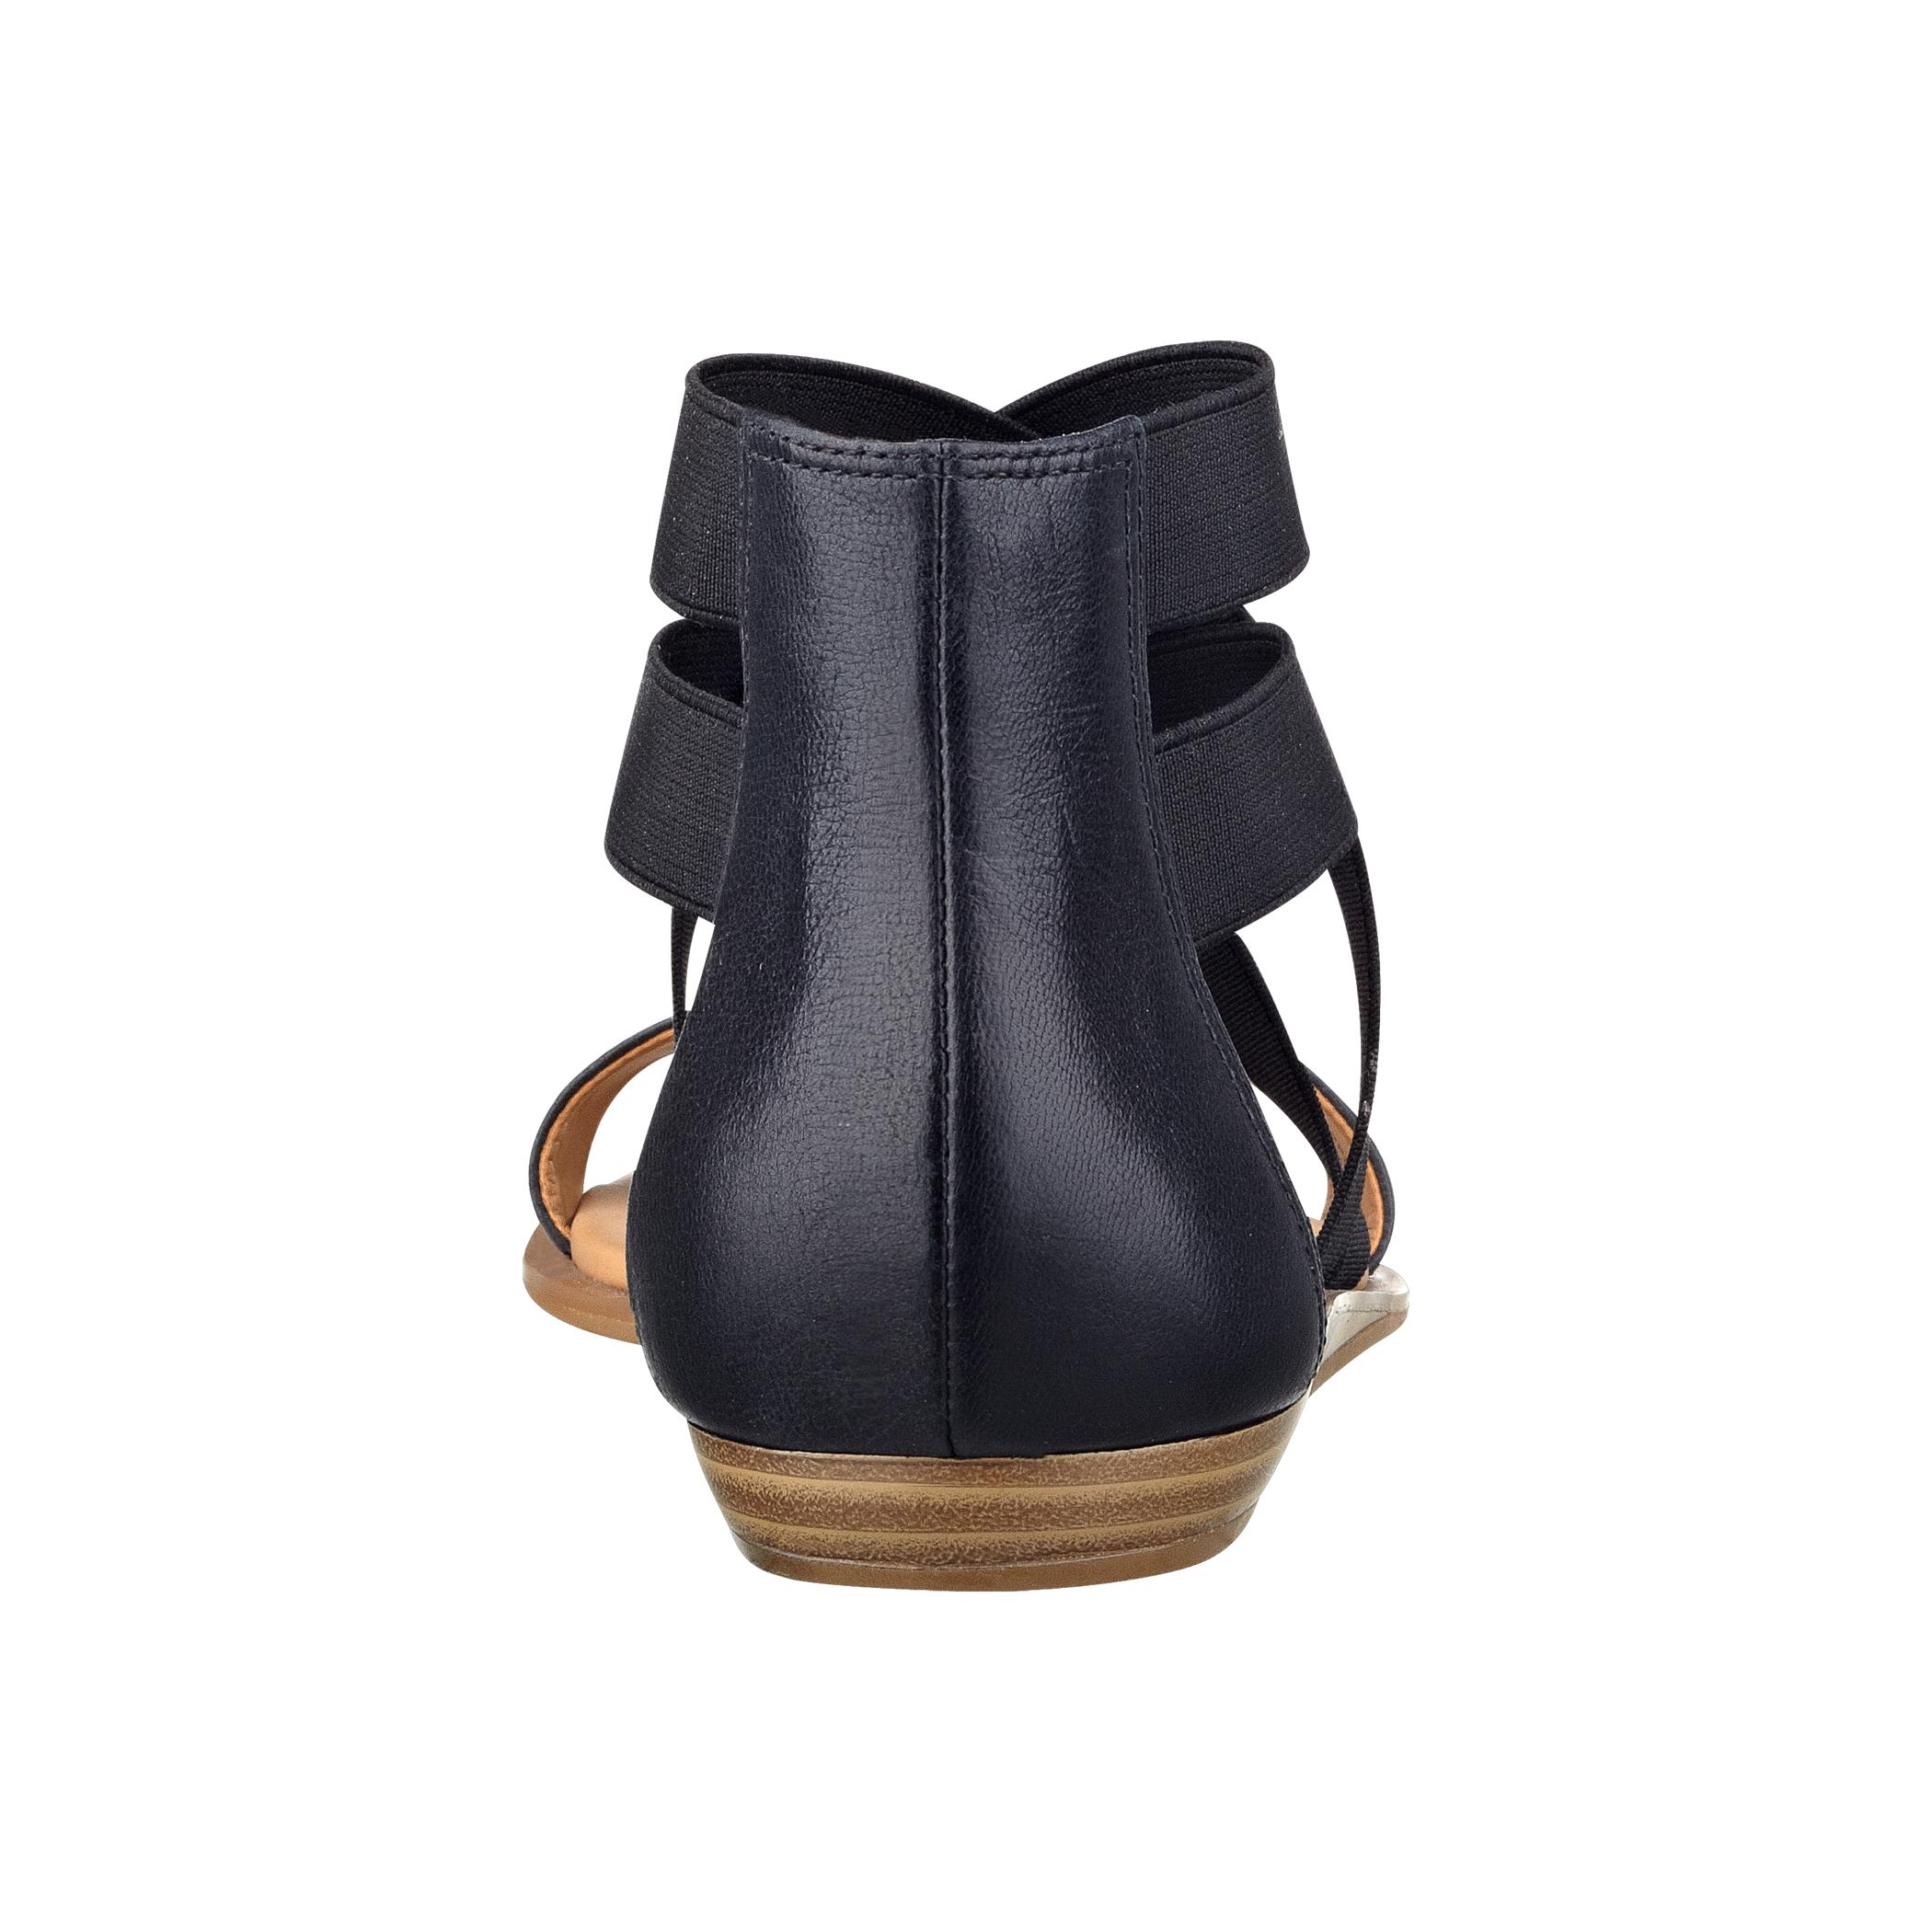 Nine West Voi Open Toe Cage Sandals In Black Lyst